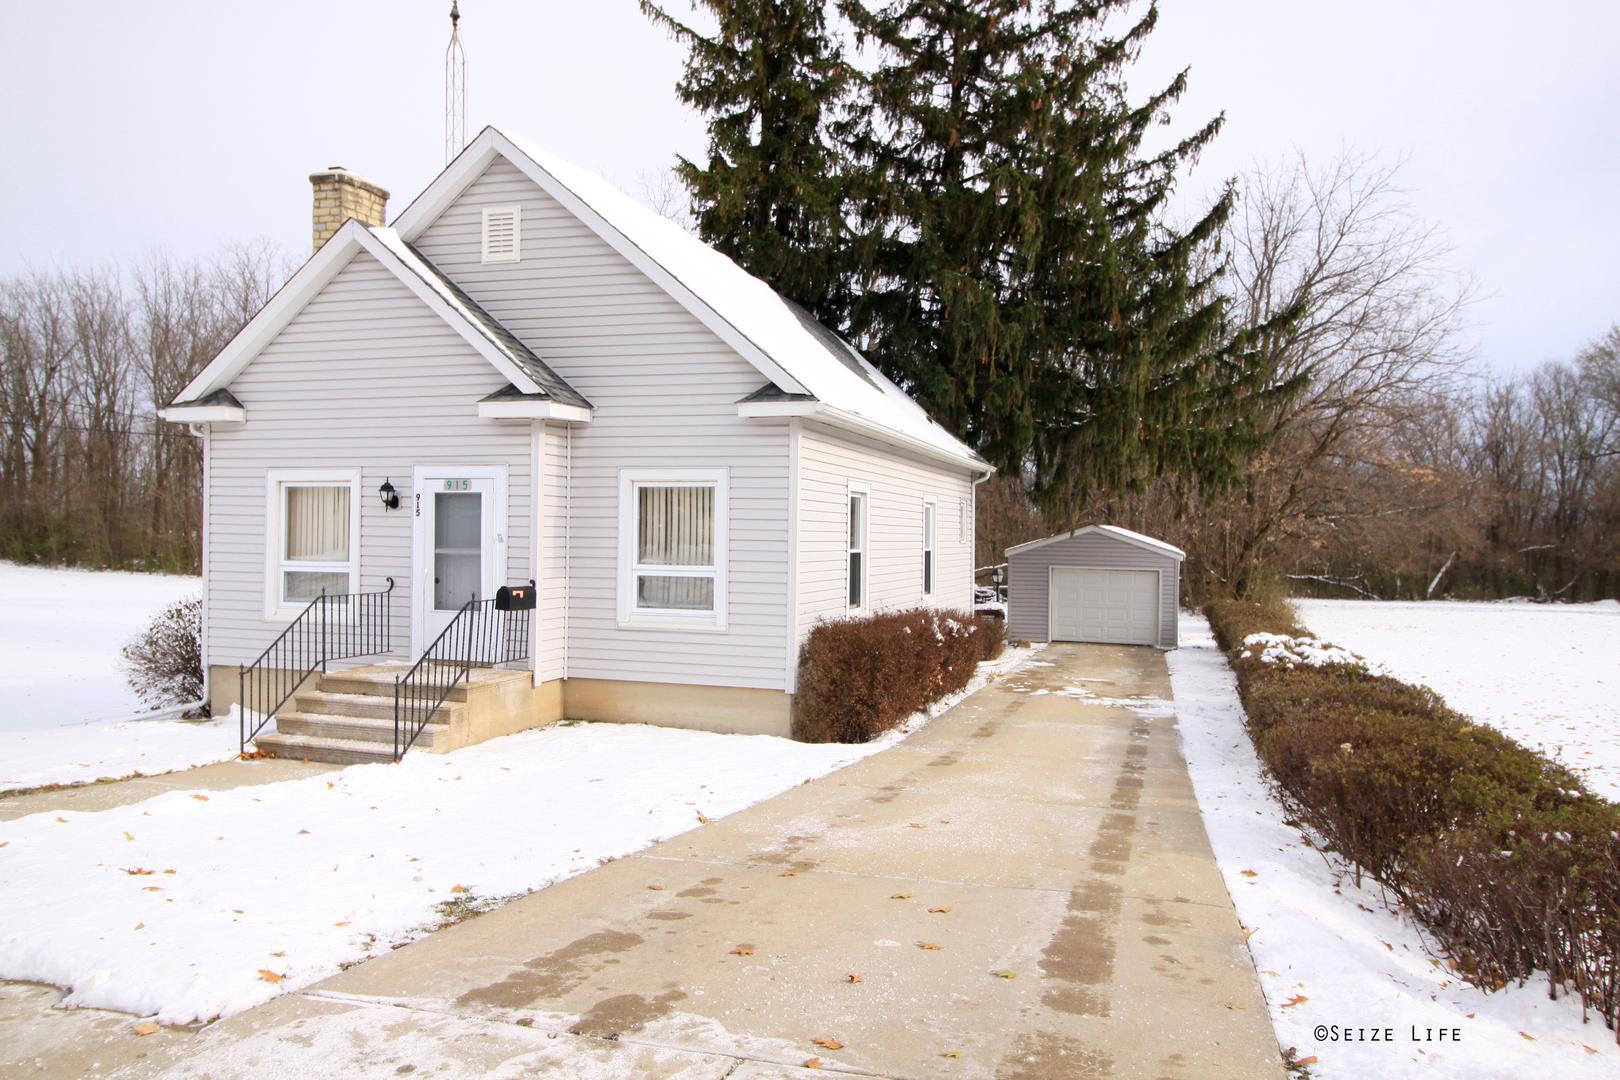 915 South State, Marengo, Illinois, 60152